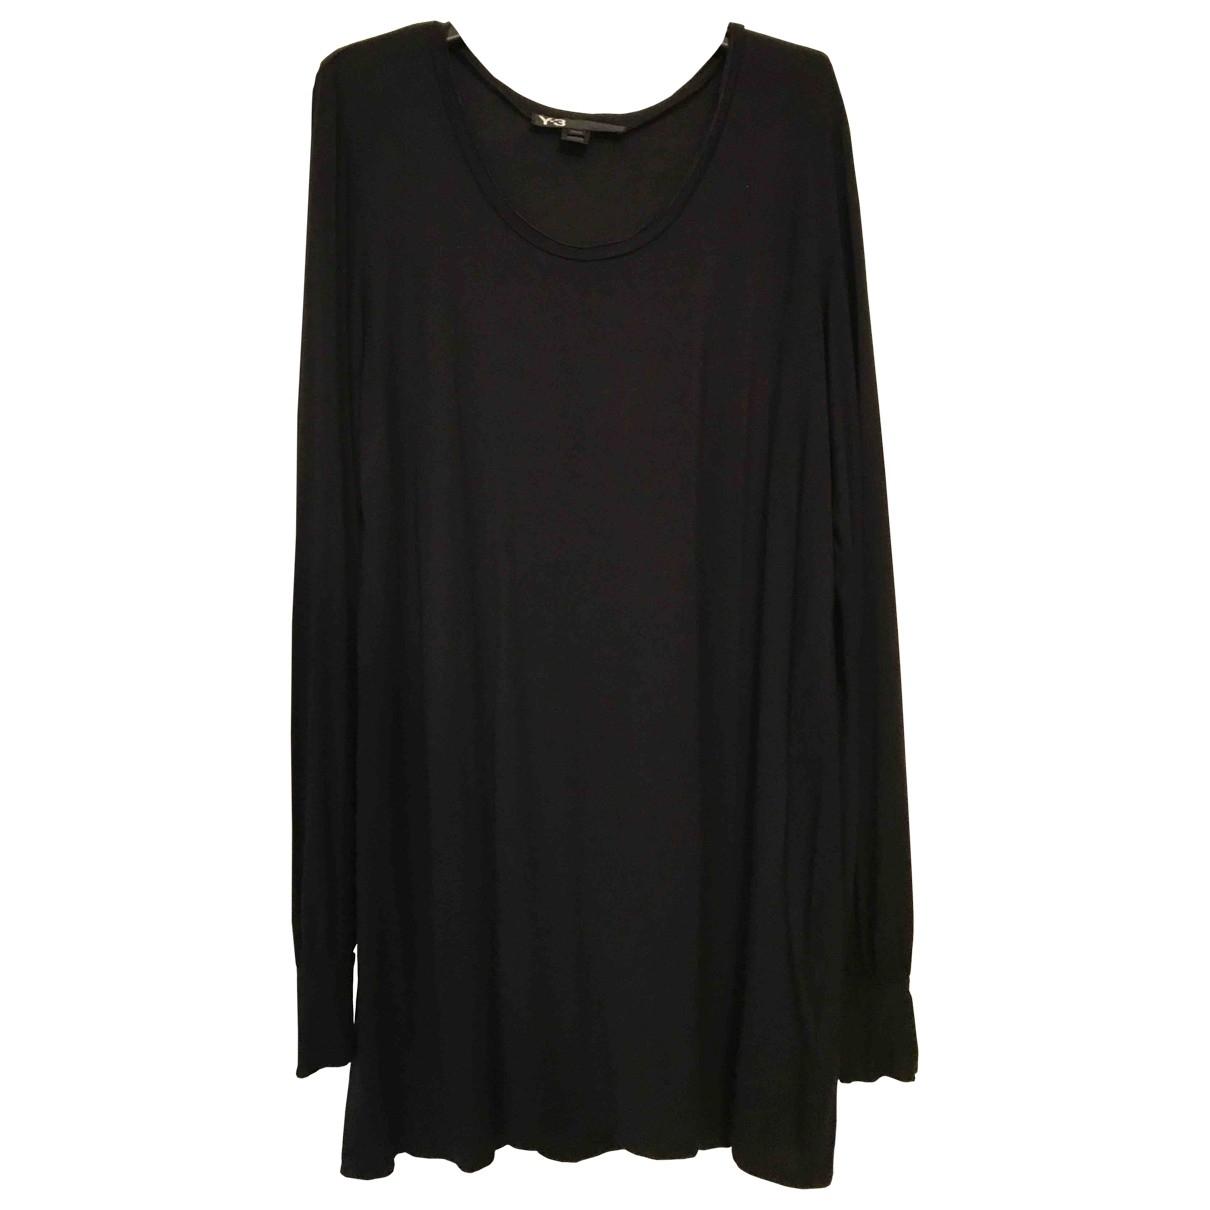 Y-3 \N Black dress for Women M International